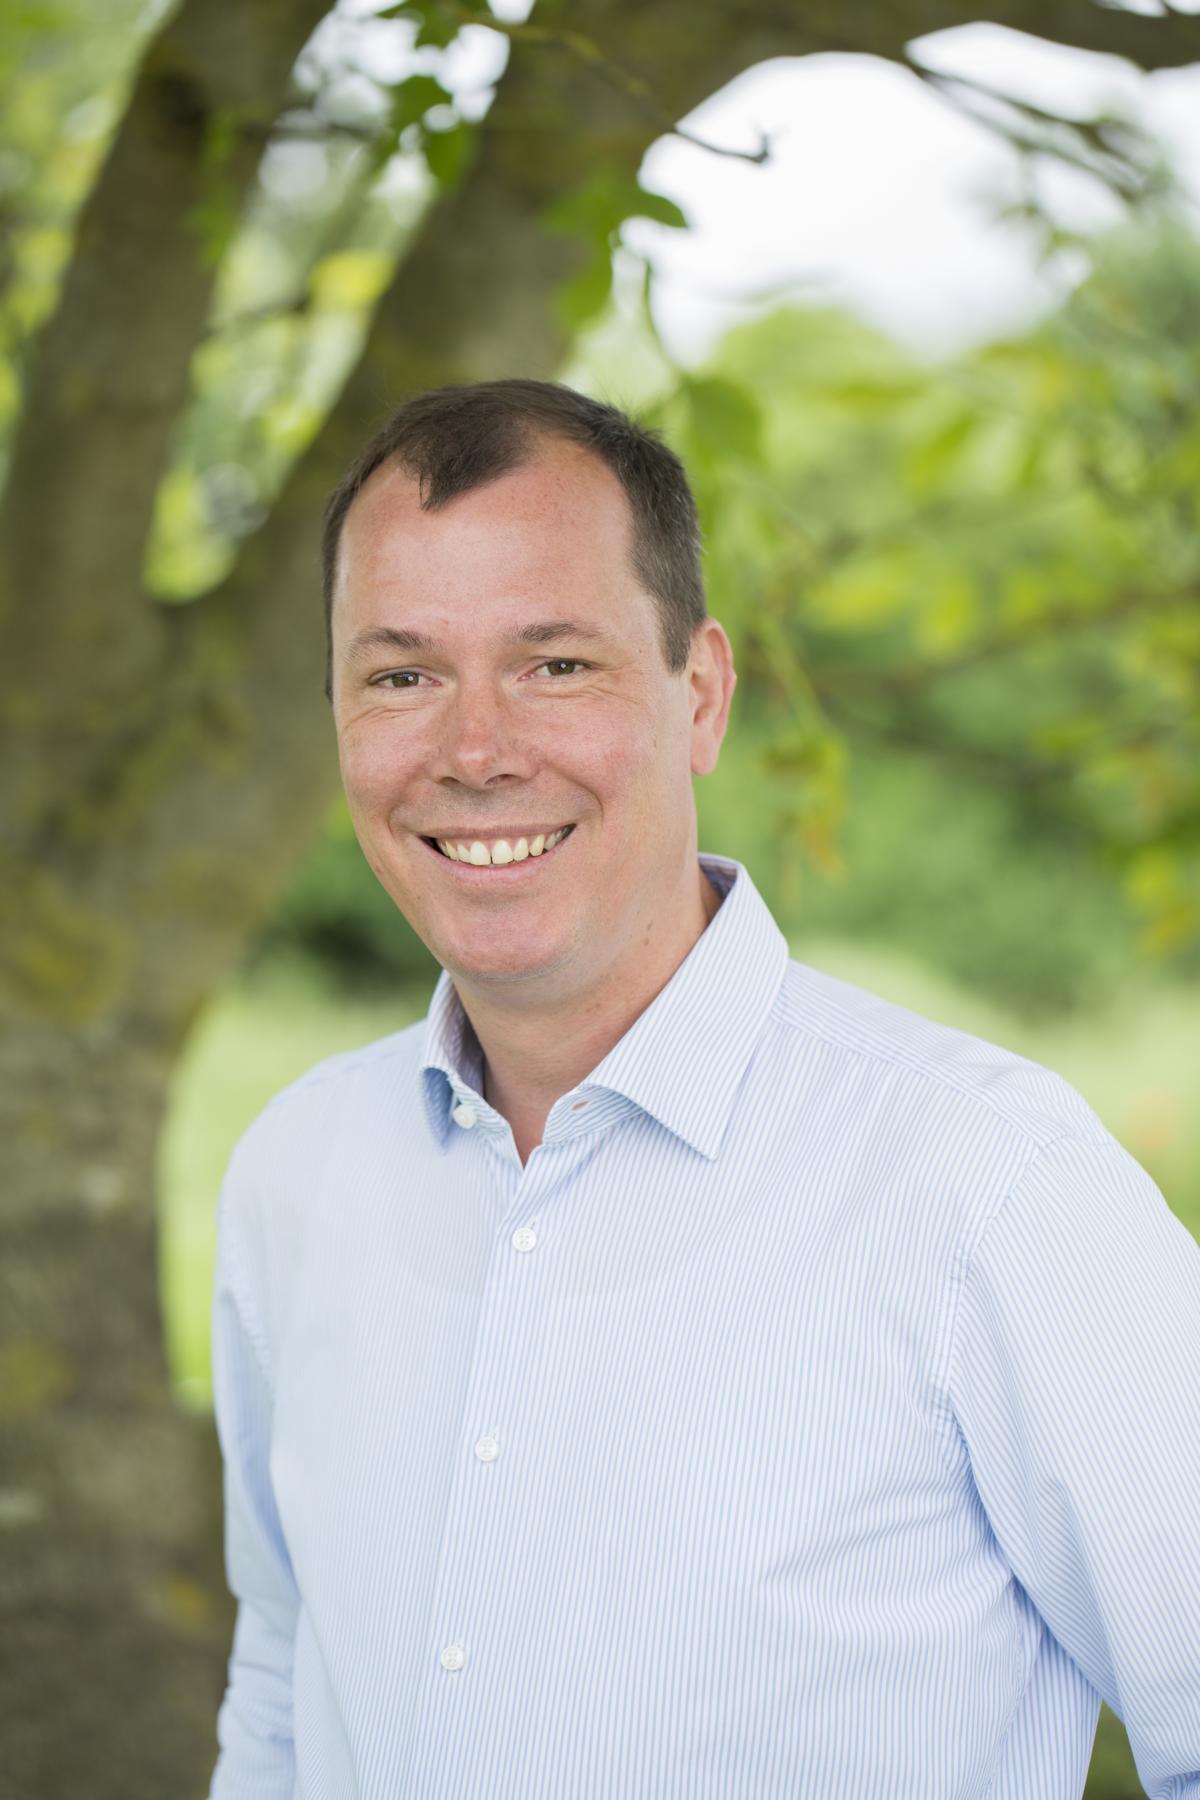 Portrait Robert Hagemann, Geschäftsführer